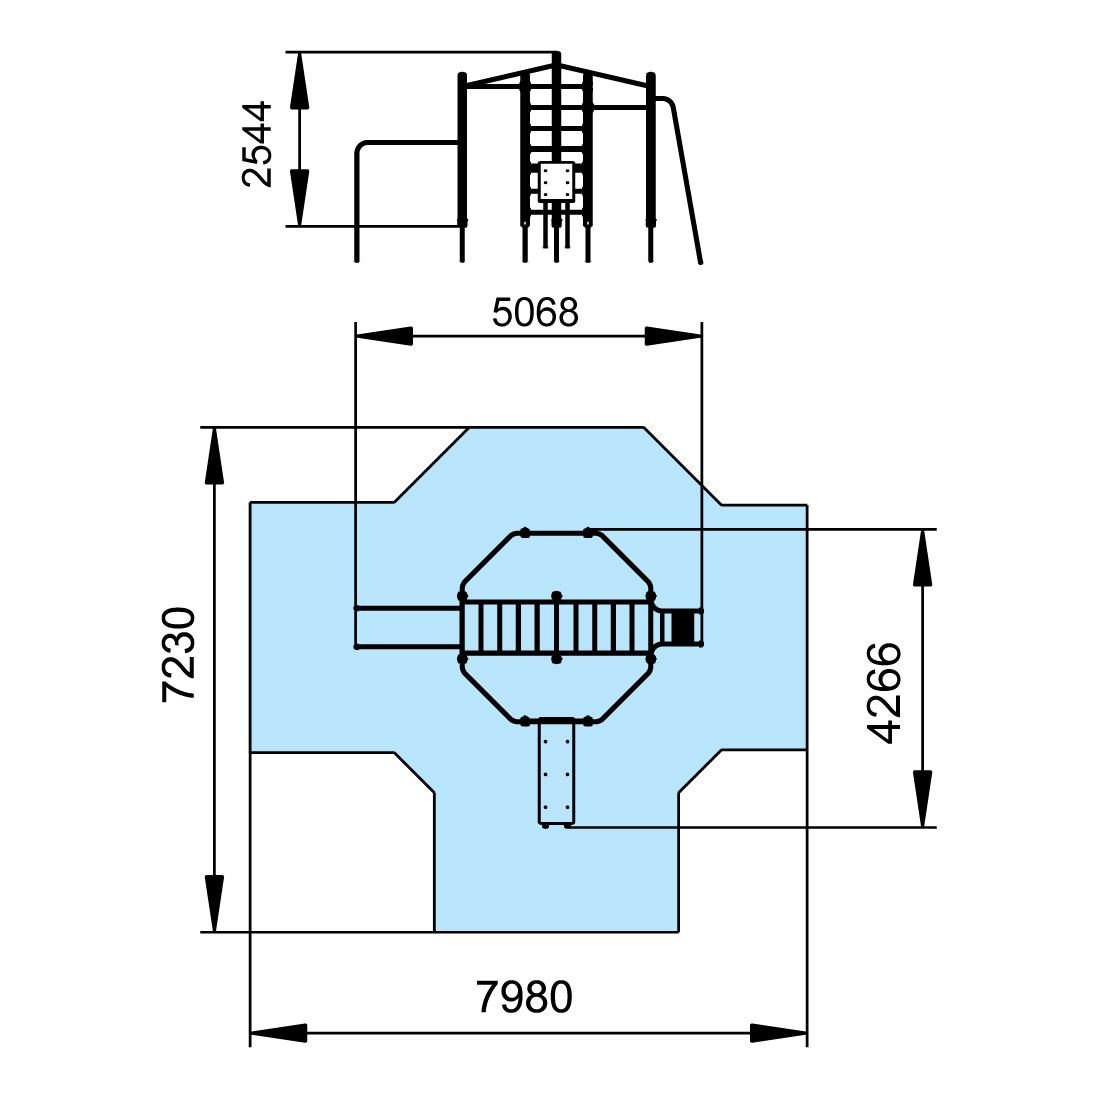 Acrobat Gymnastic Set S726 Schematic Diagram 7230 Download Drawing